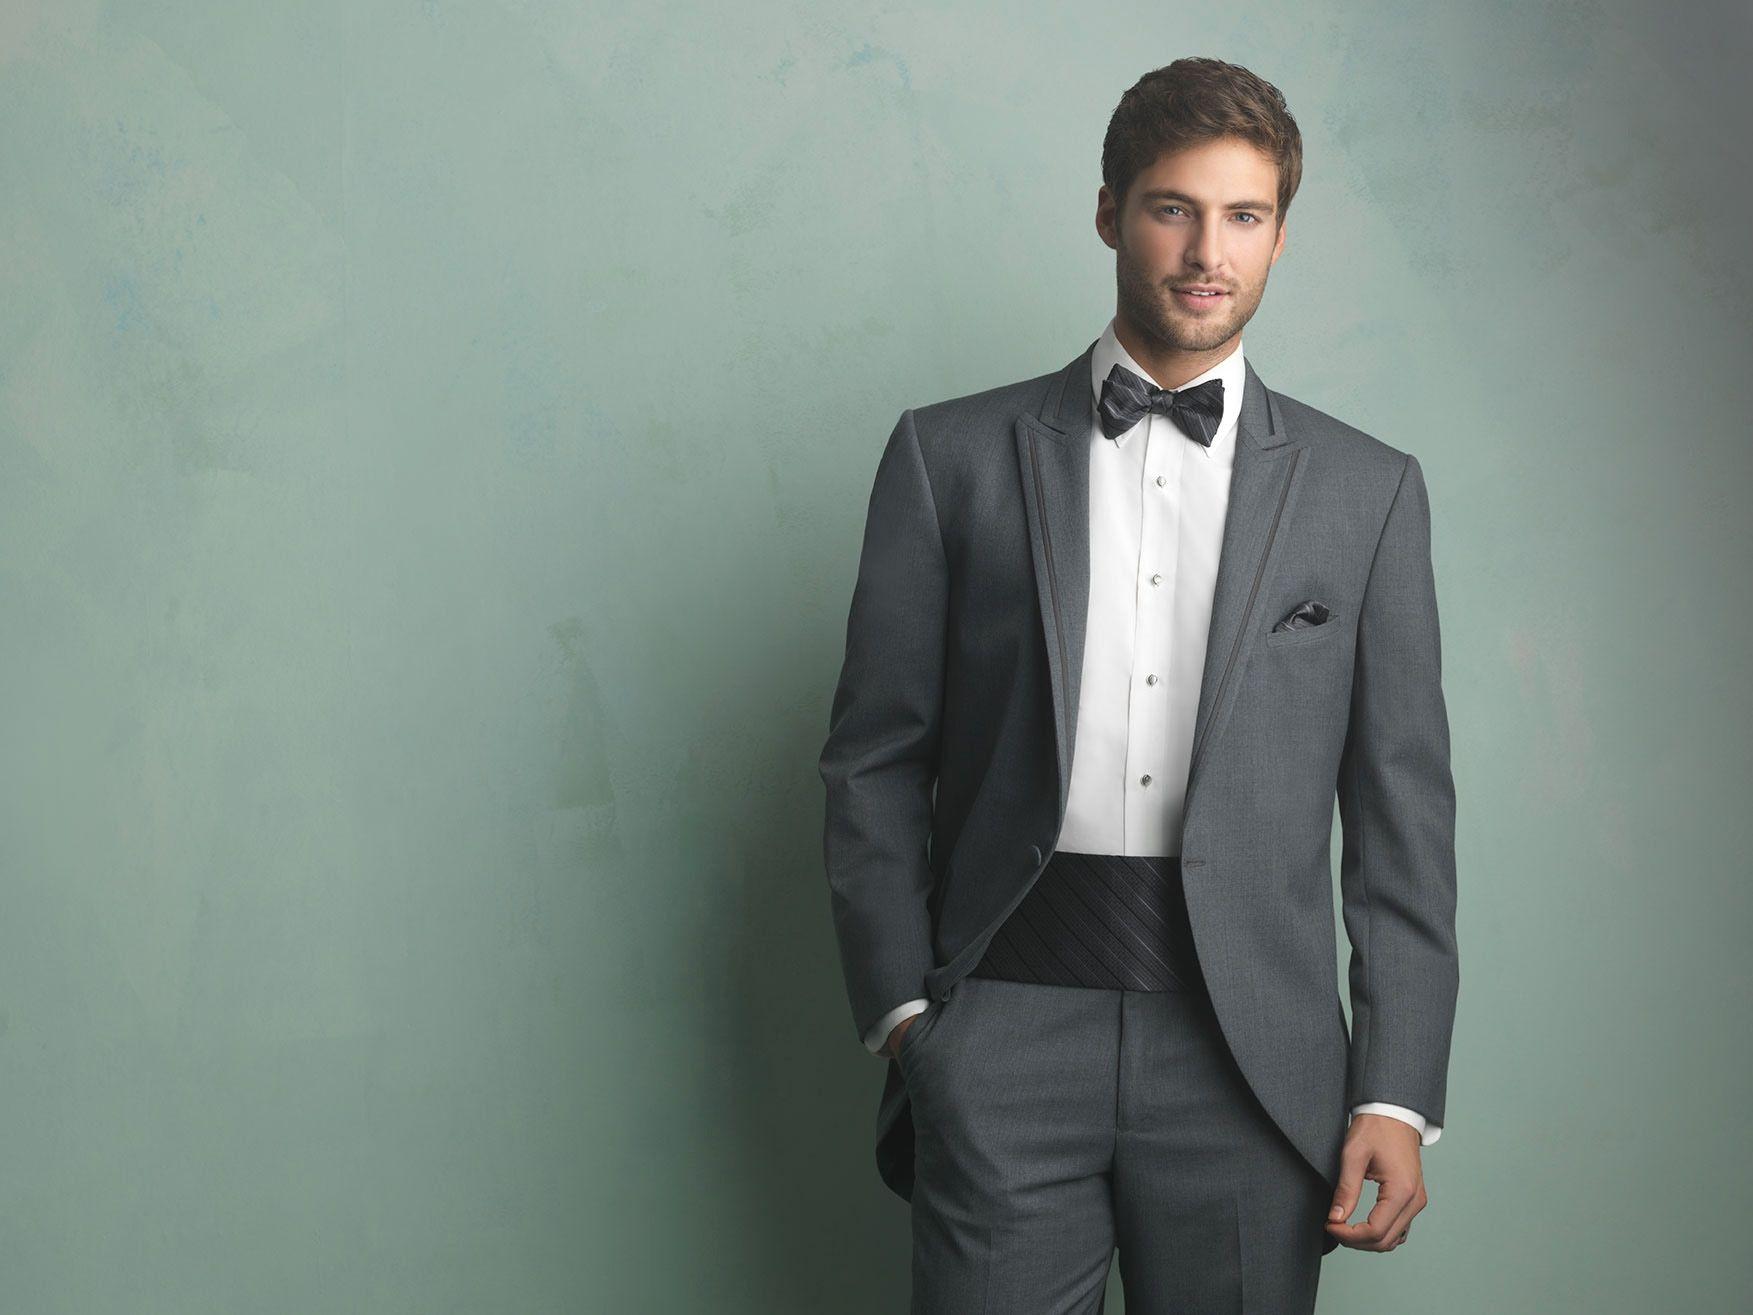 Dorable Wedding Suit Hire Brighton Vignette - All Wedding Dresses ...